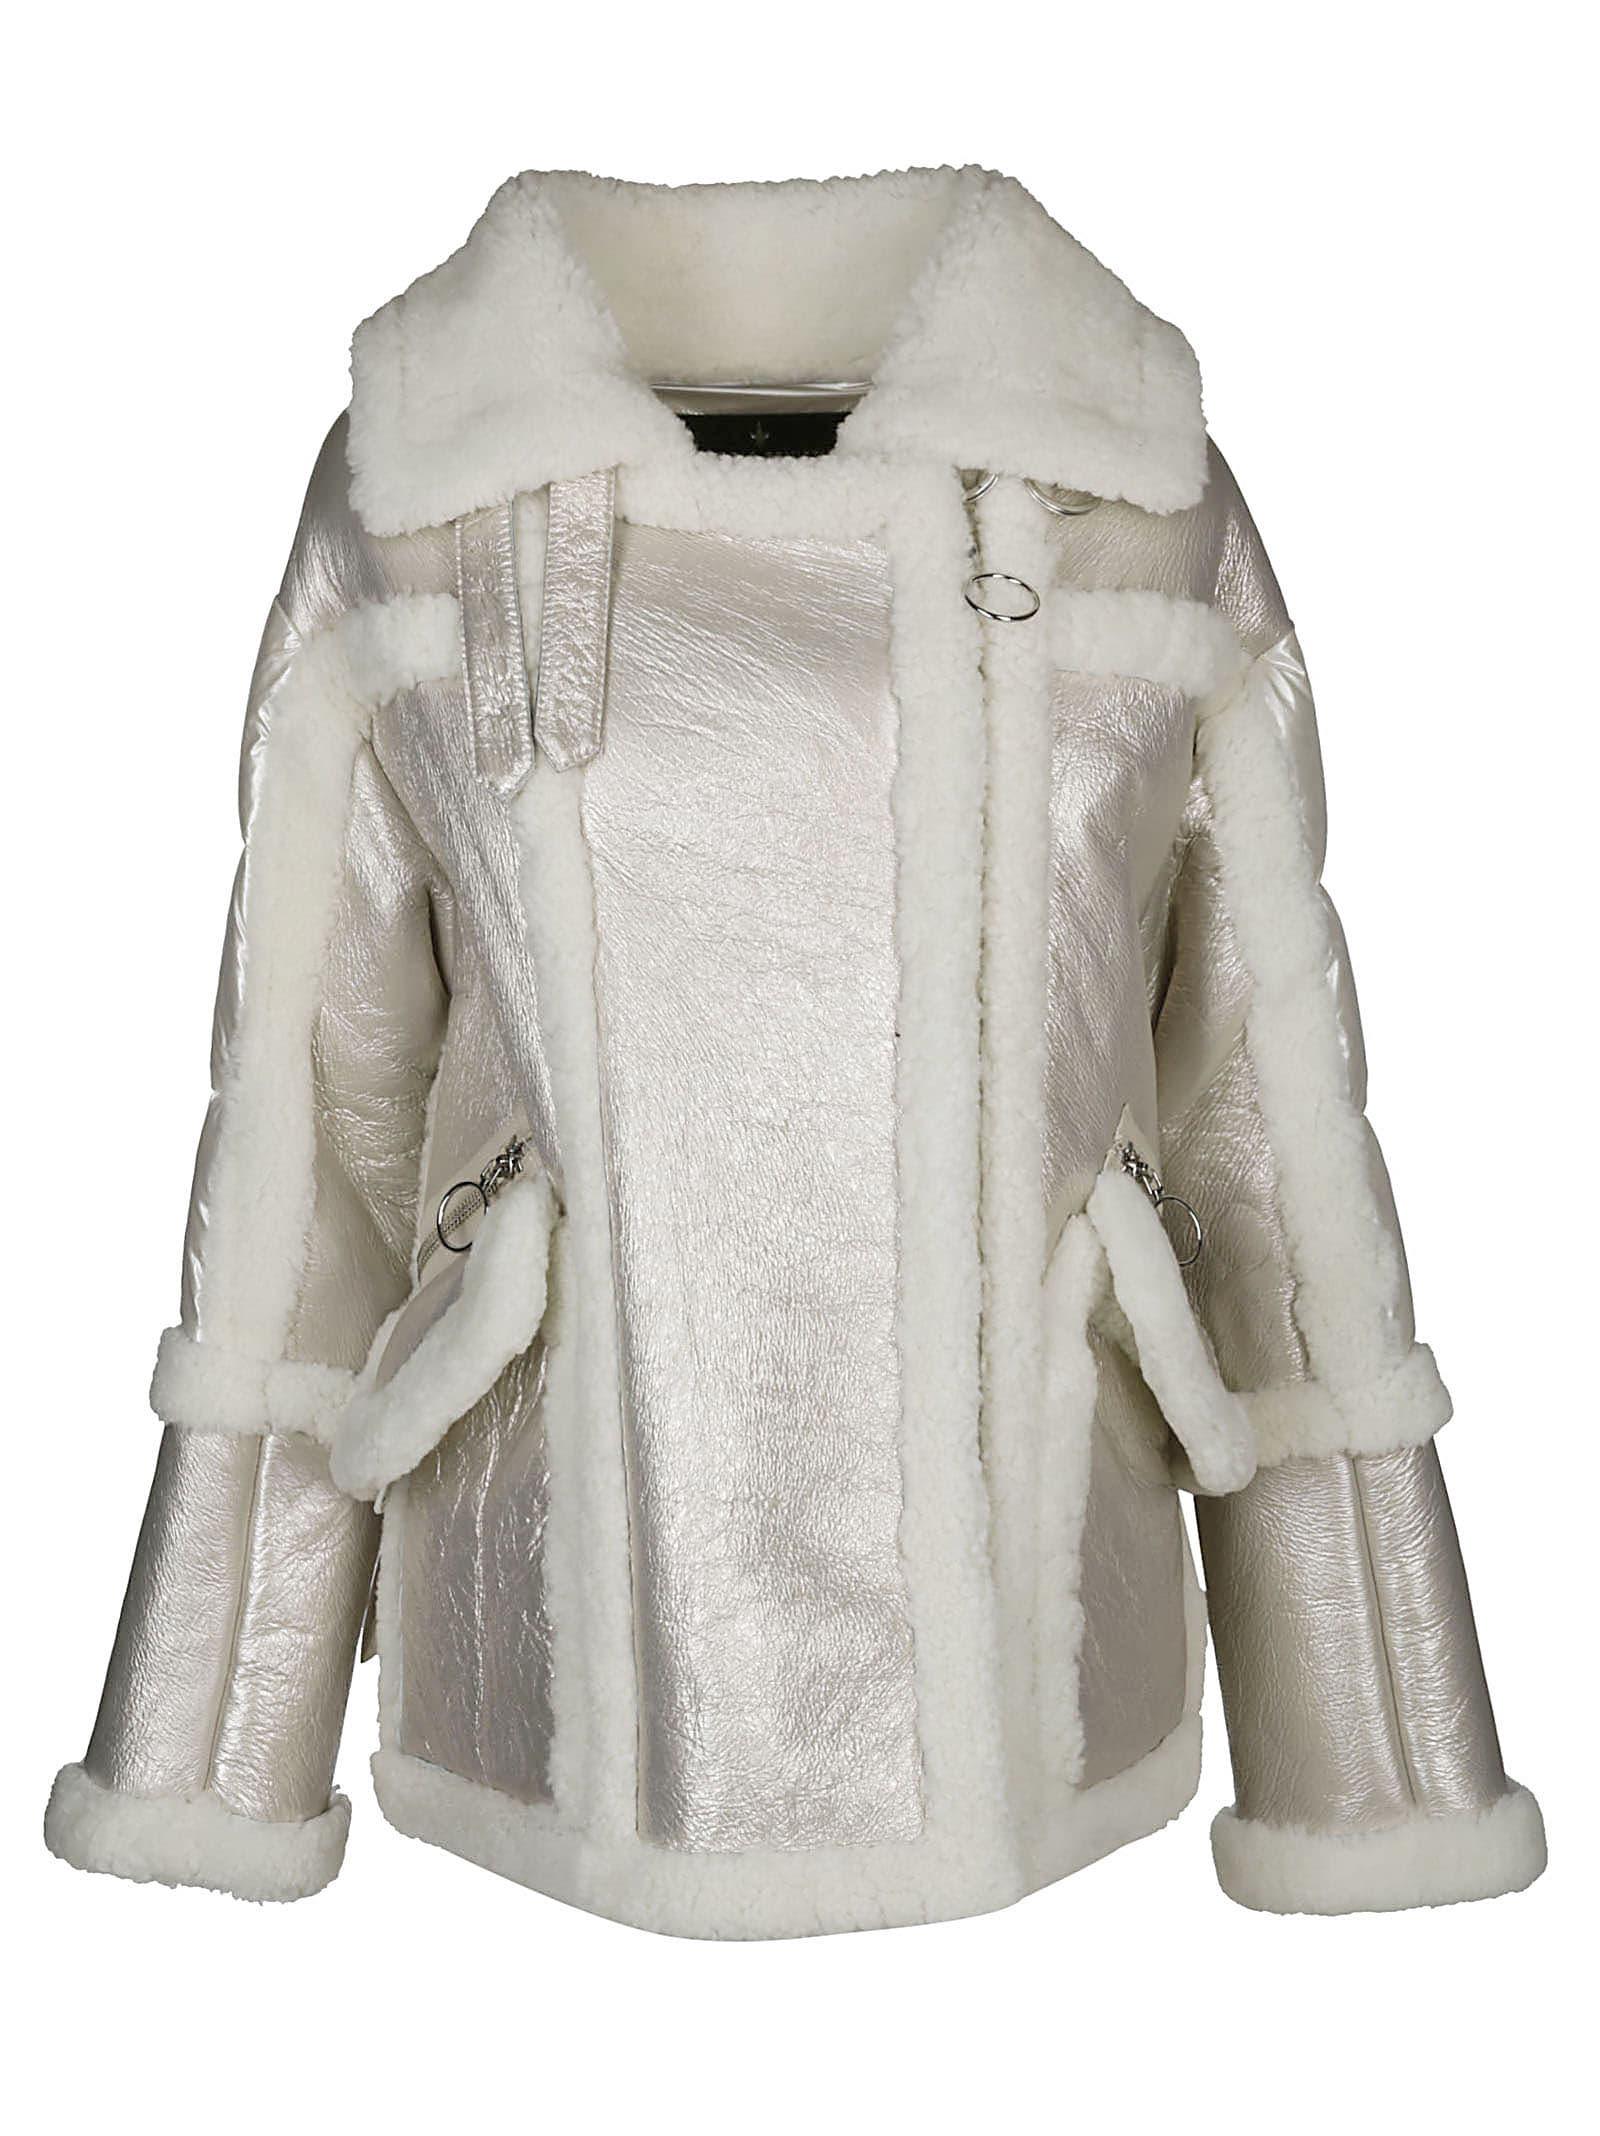 Nicole Benisti Montaign Shearing-trim Jacket